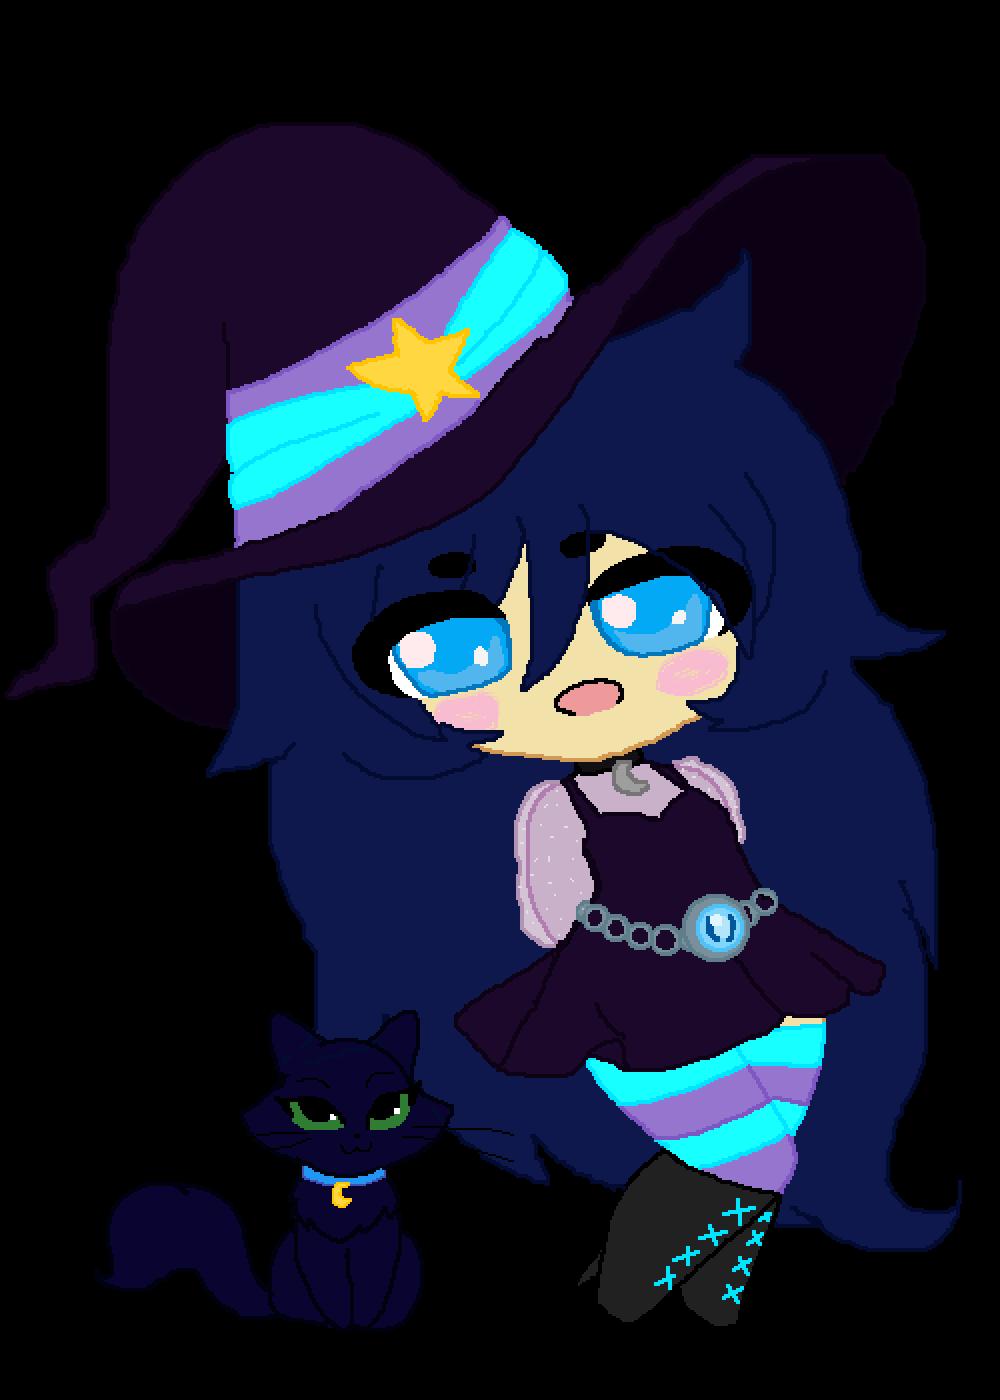 chibi witch by PurpleLion0112